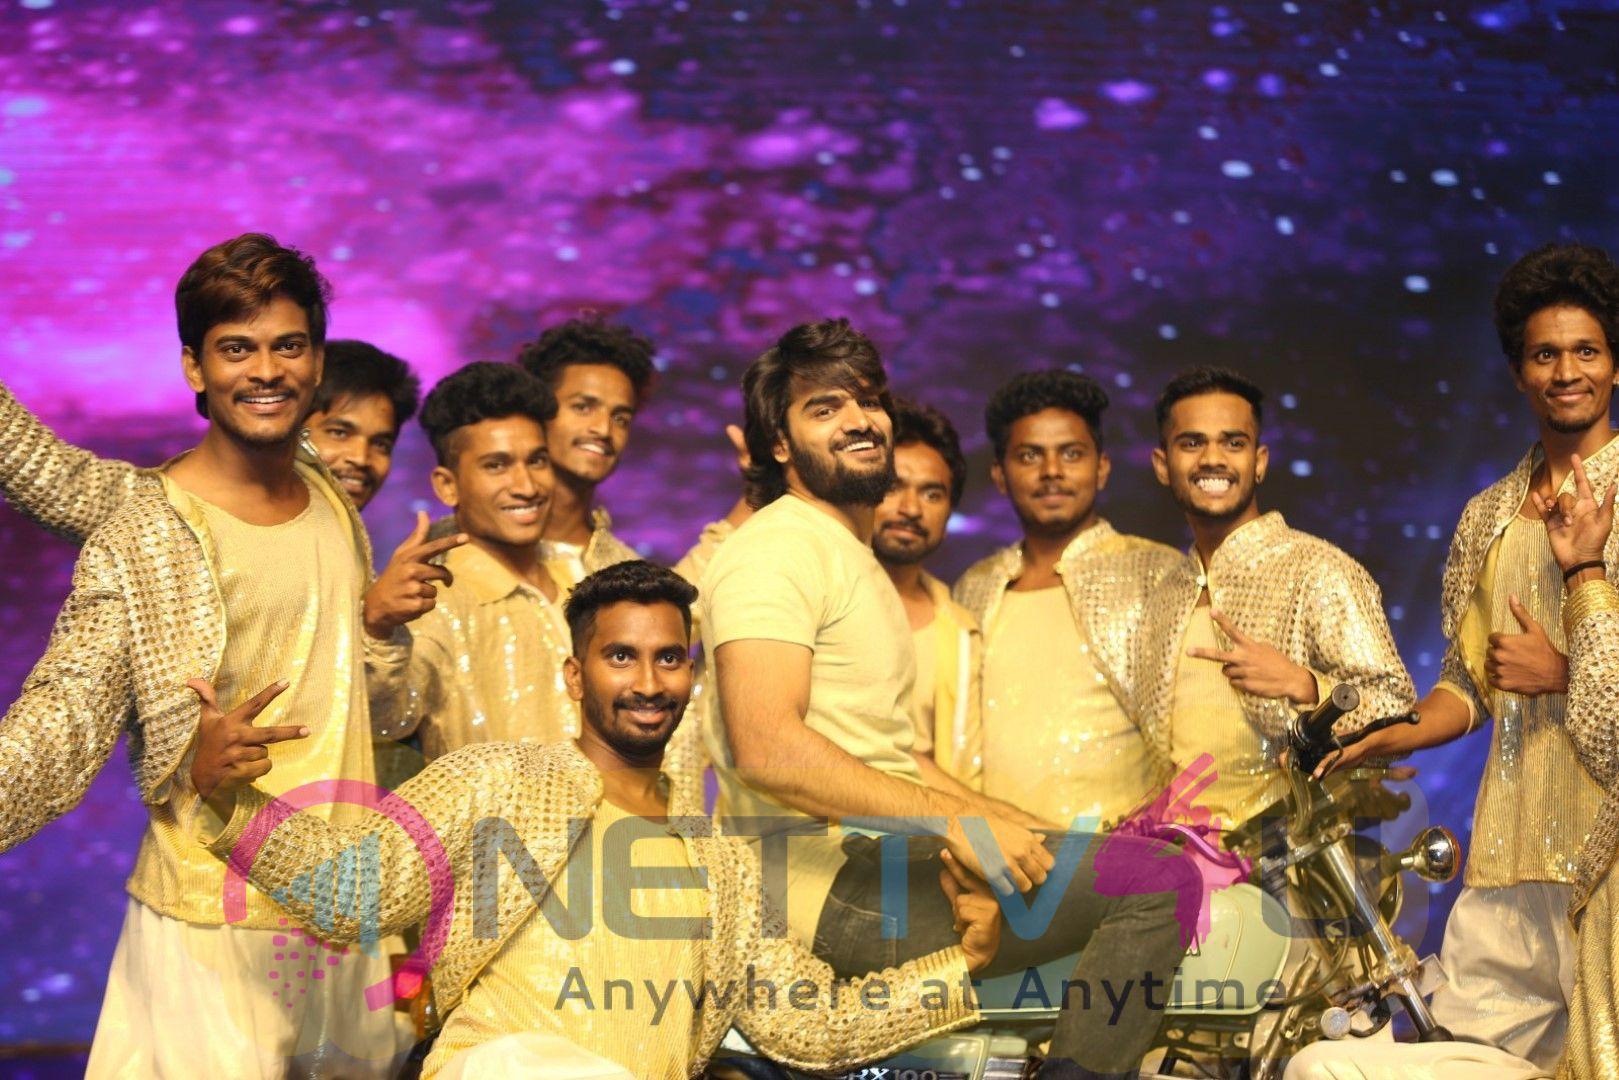 Rx 100 Telugu Movie Audio Launch Cute Images | 577849 | Movie Press